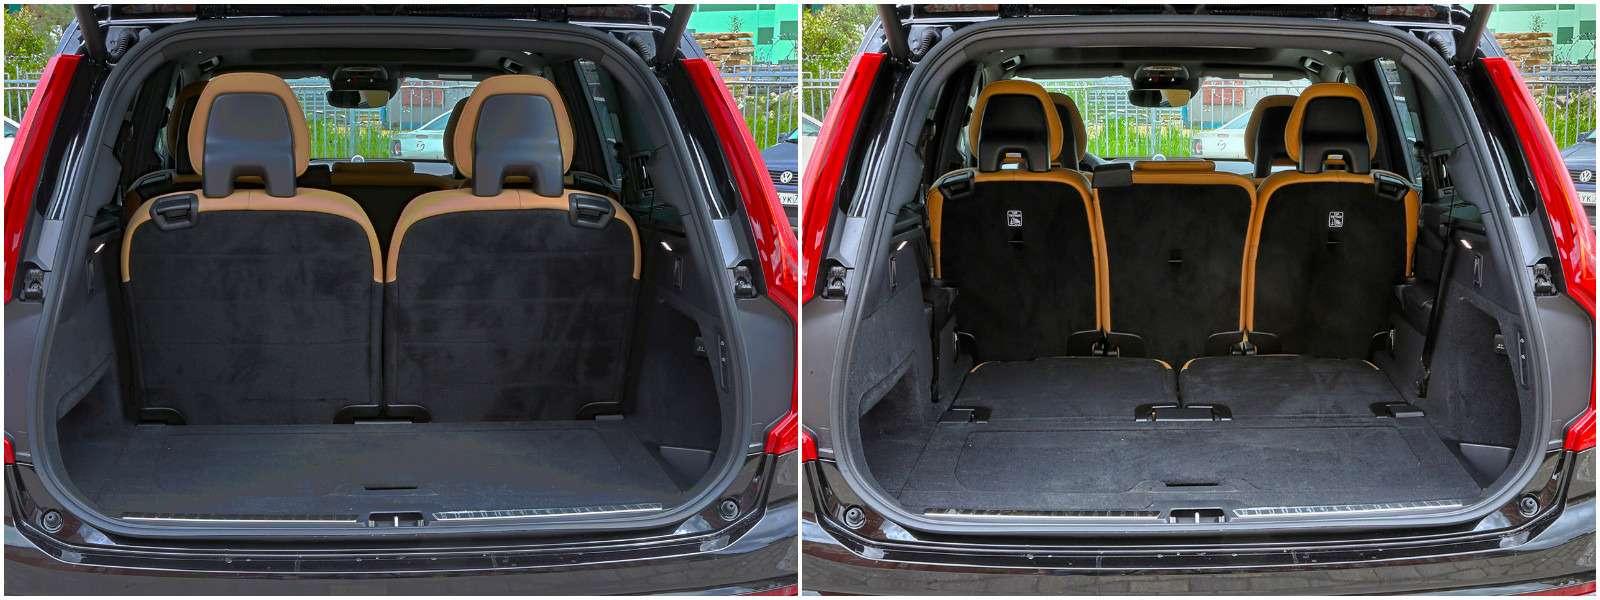 Новый Land Rover Discovery против конкурентов— тест ЗР— фото 784730